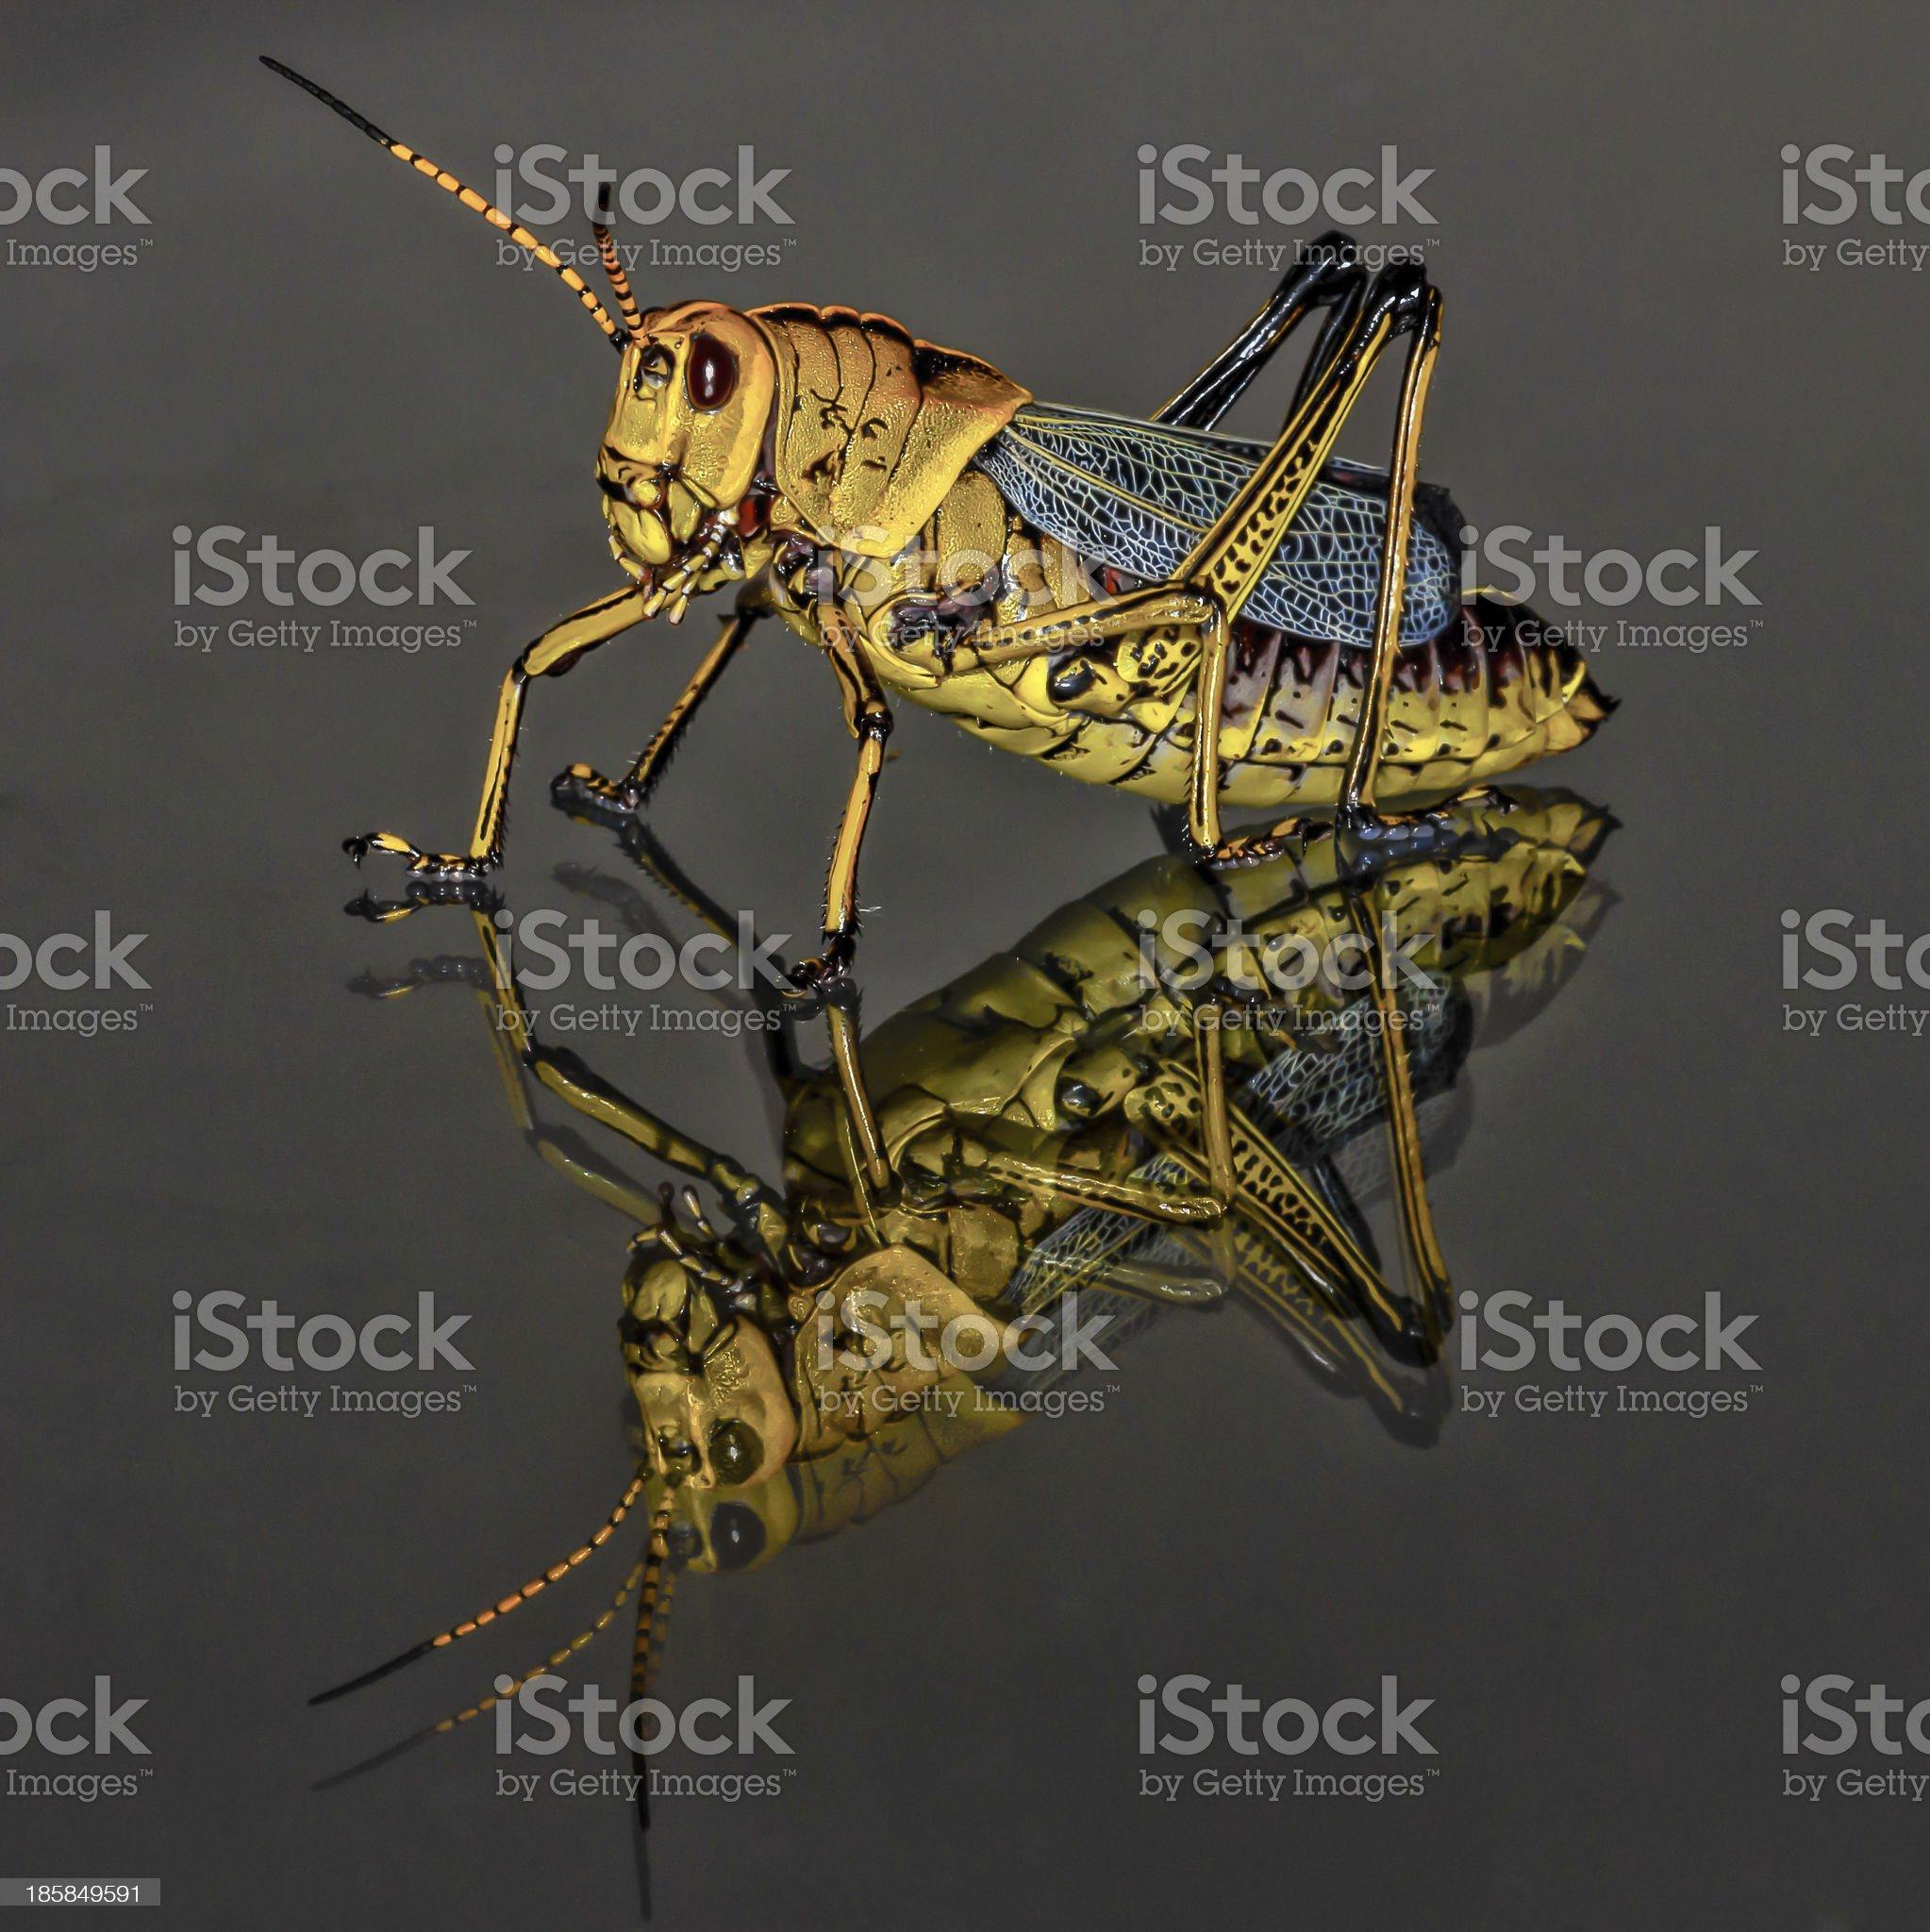 Black and Yellow Grasshopper Macro Closeup royalty-free stock photo